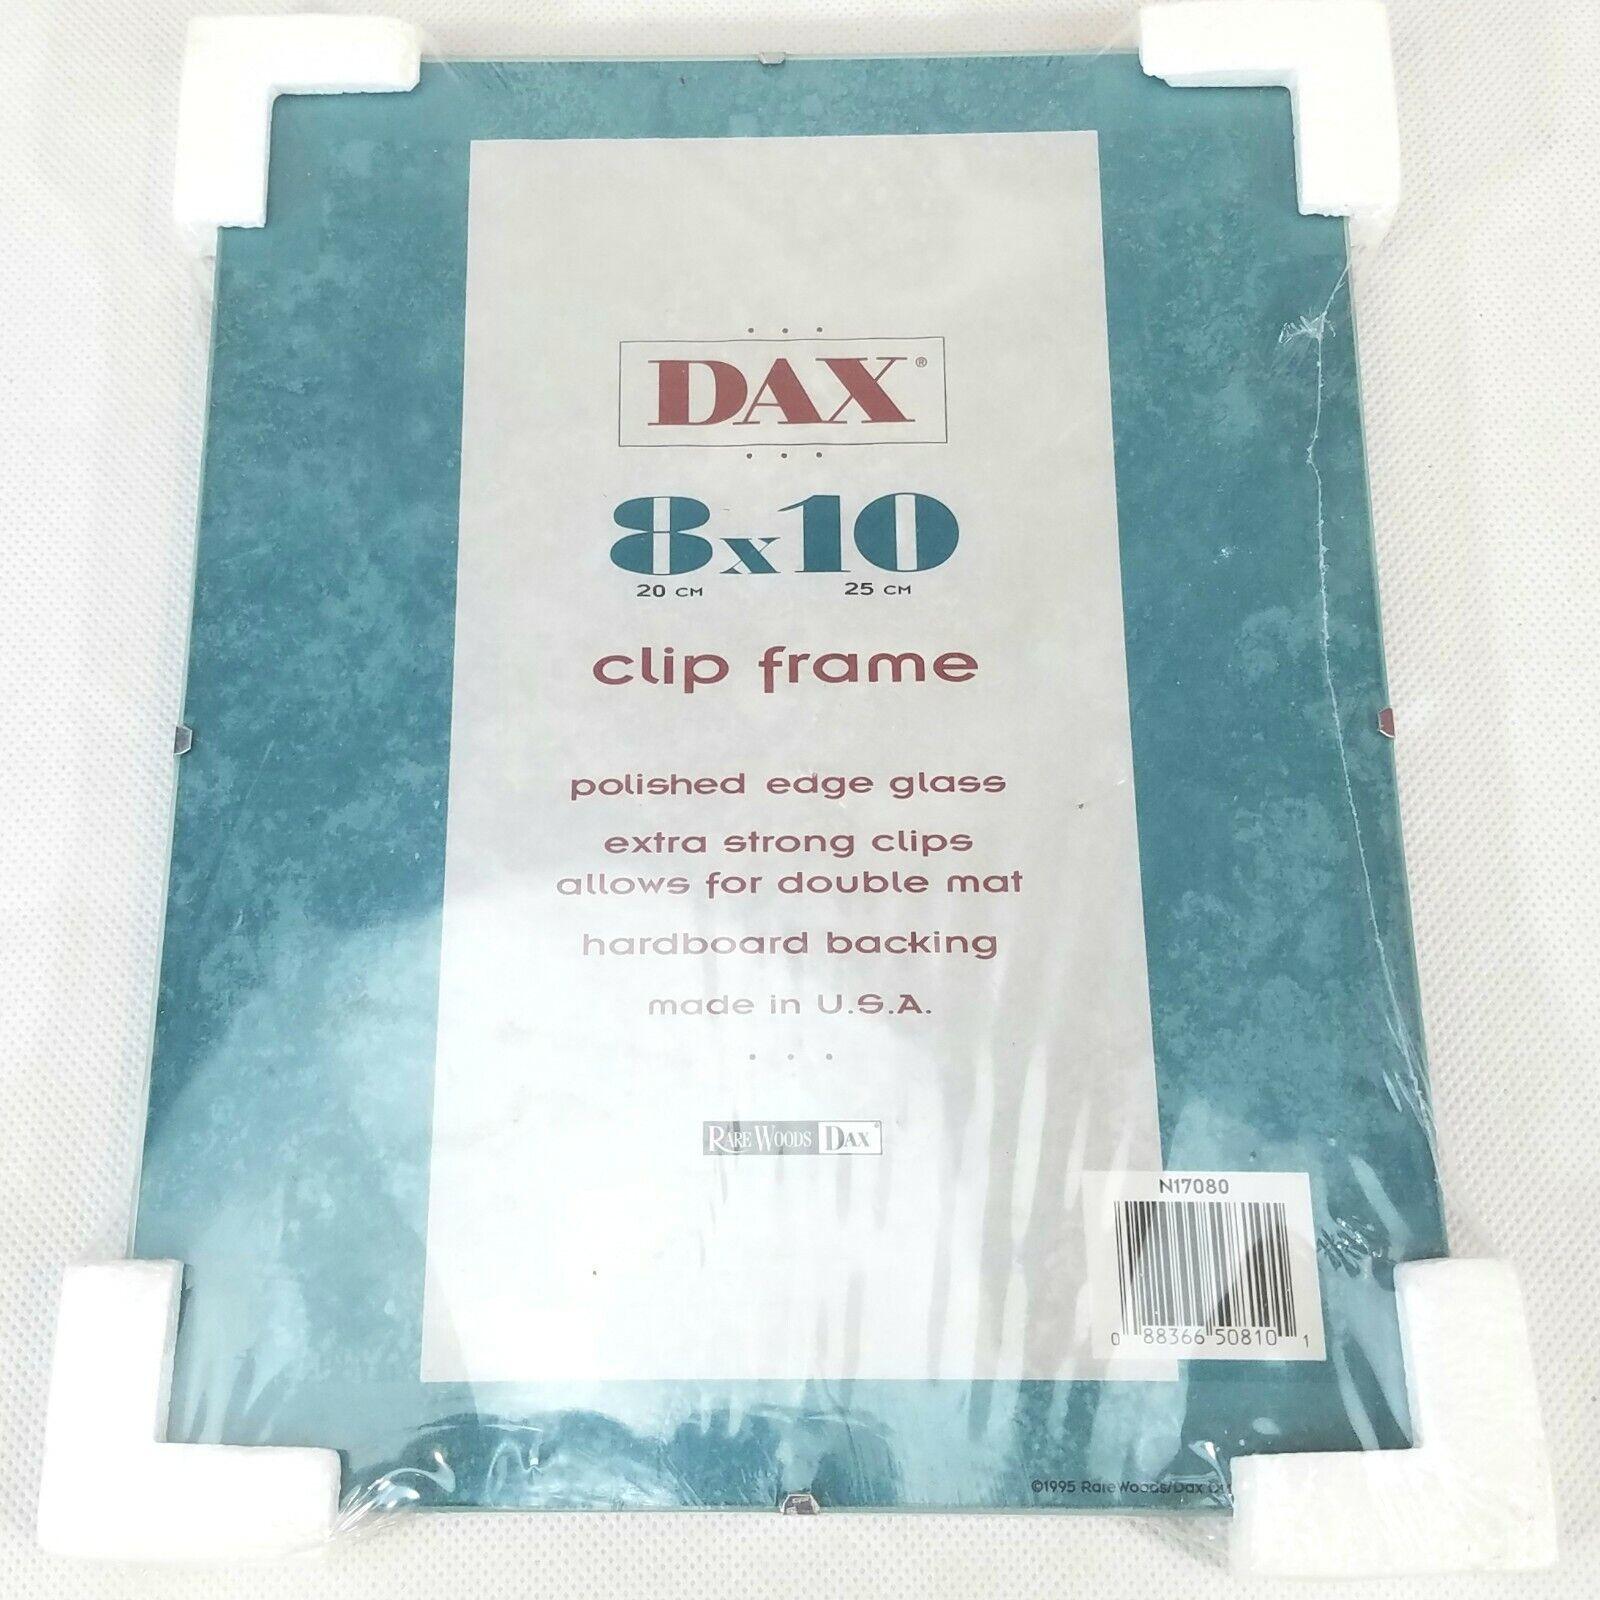 Dax 8x10 Clip frame document achievment certificate polished